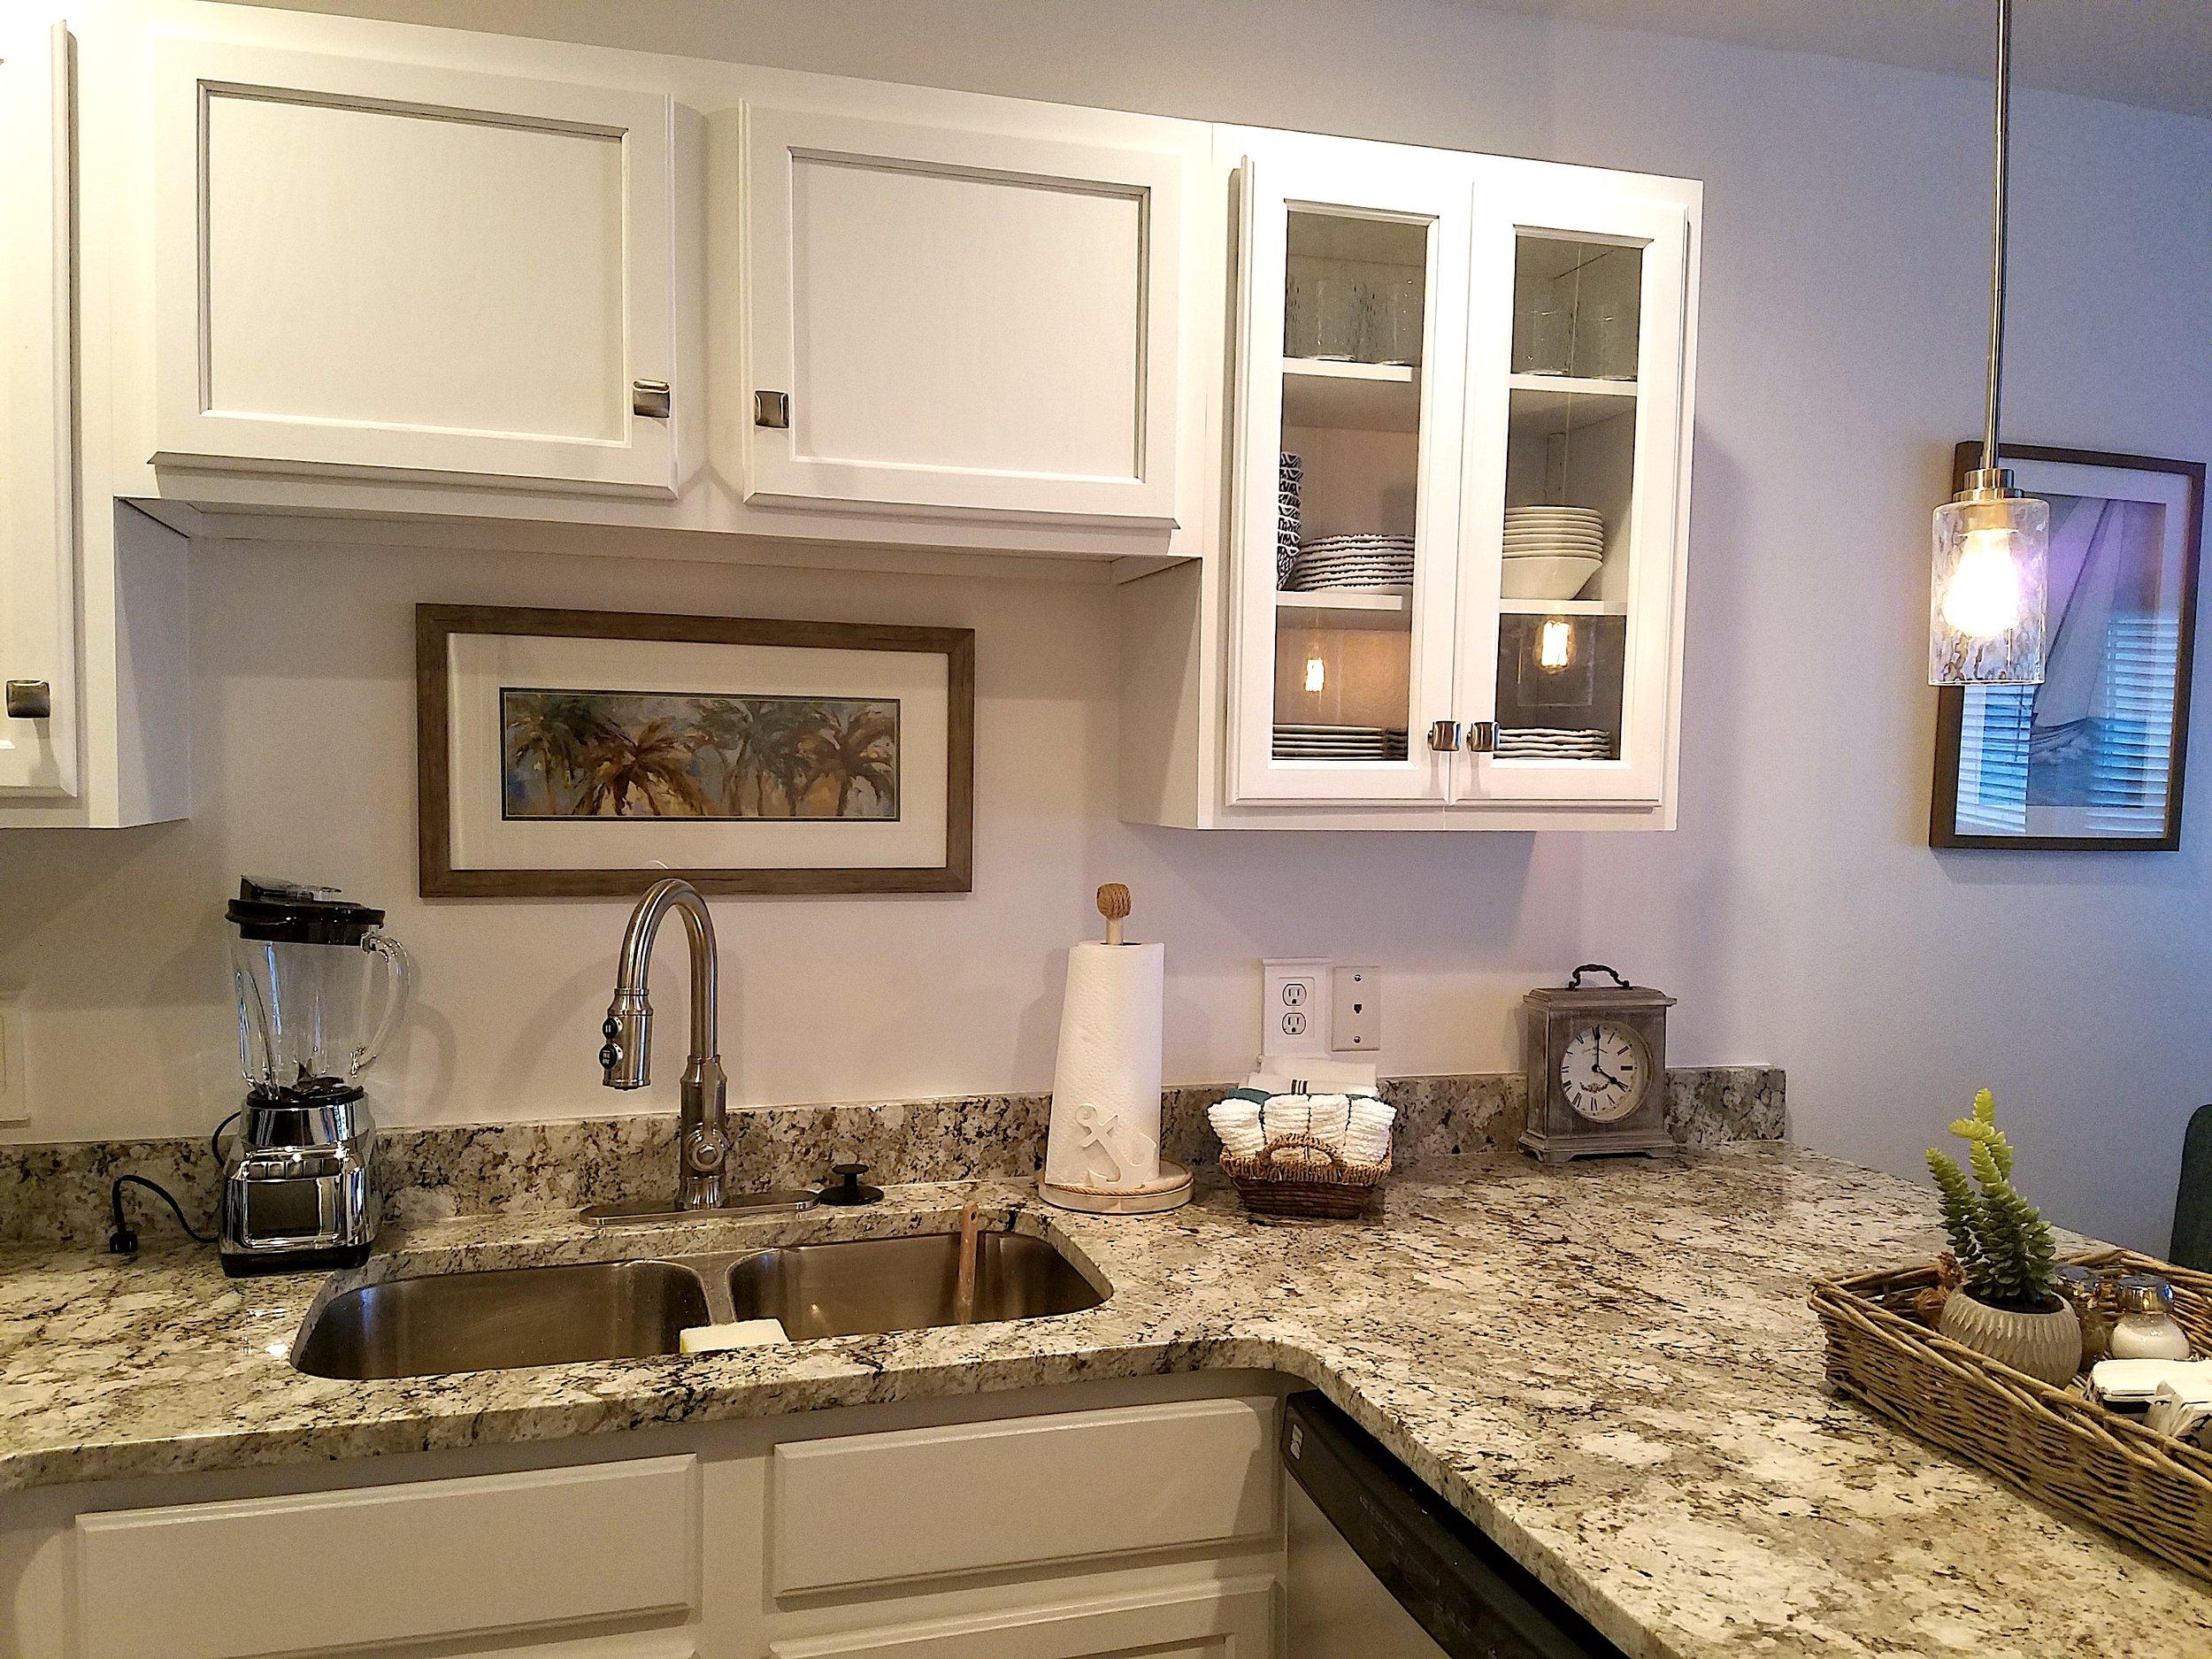 Kitchen Sink and Cabinets.jpg